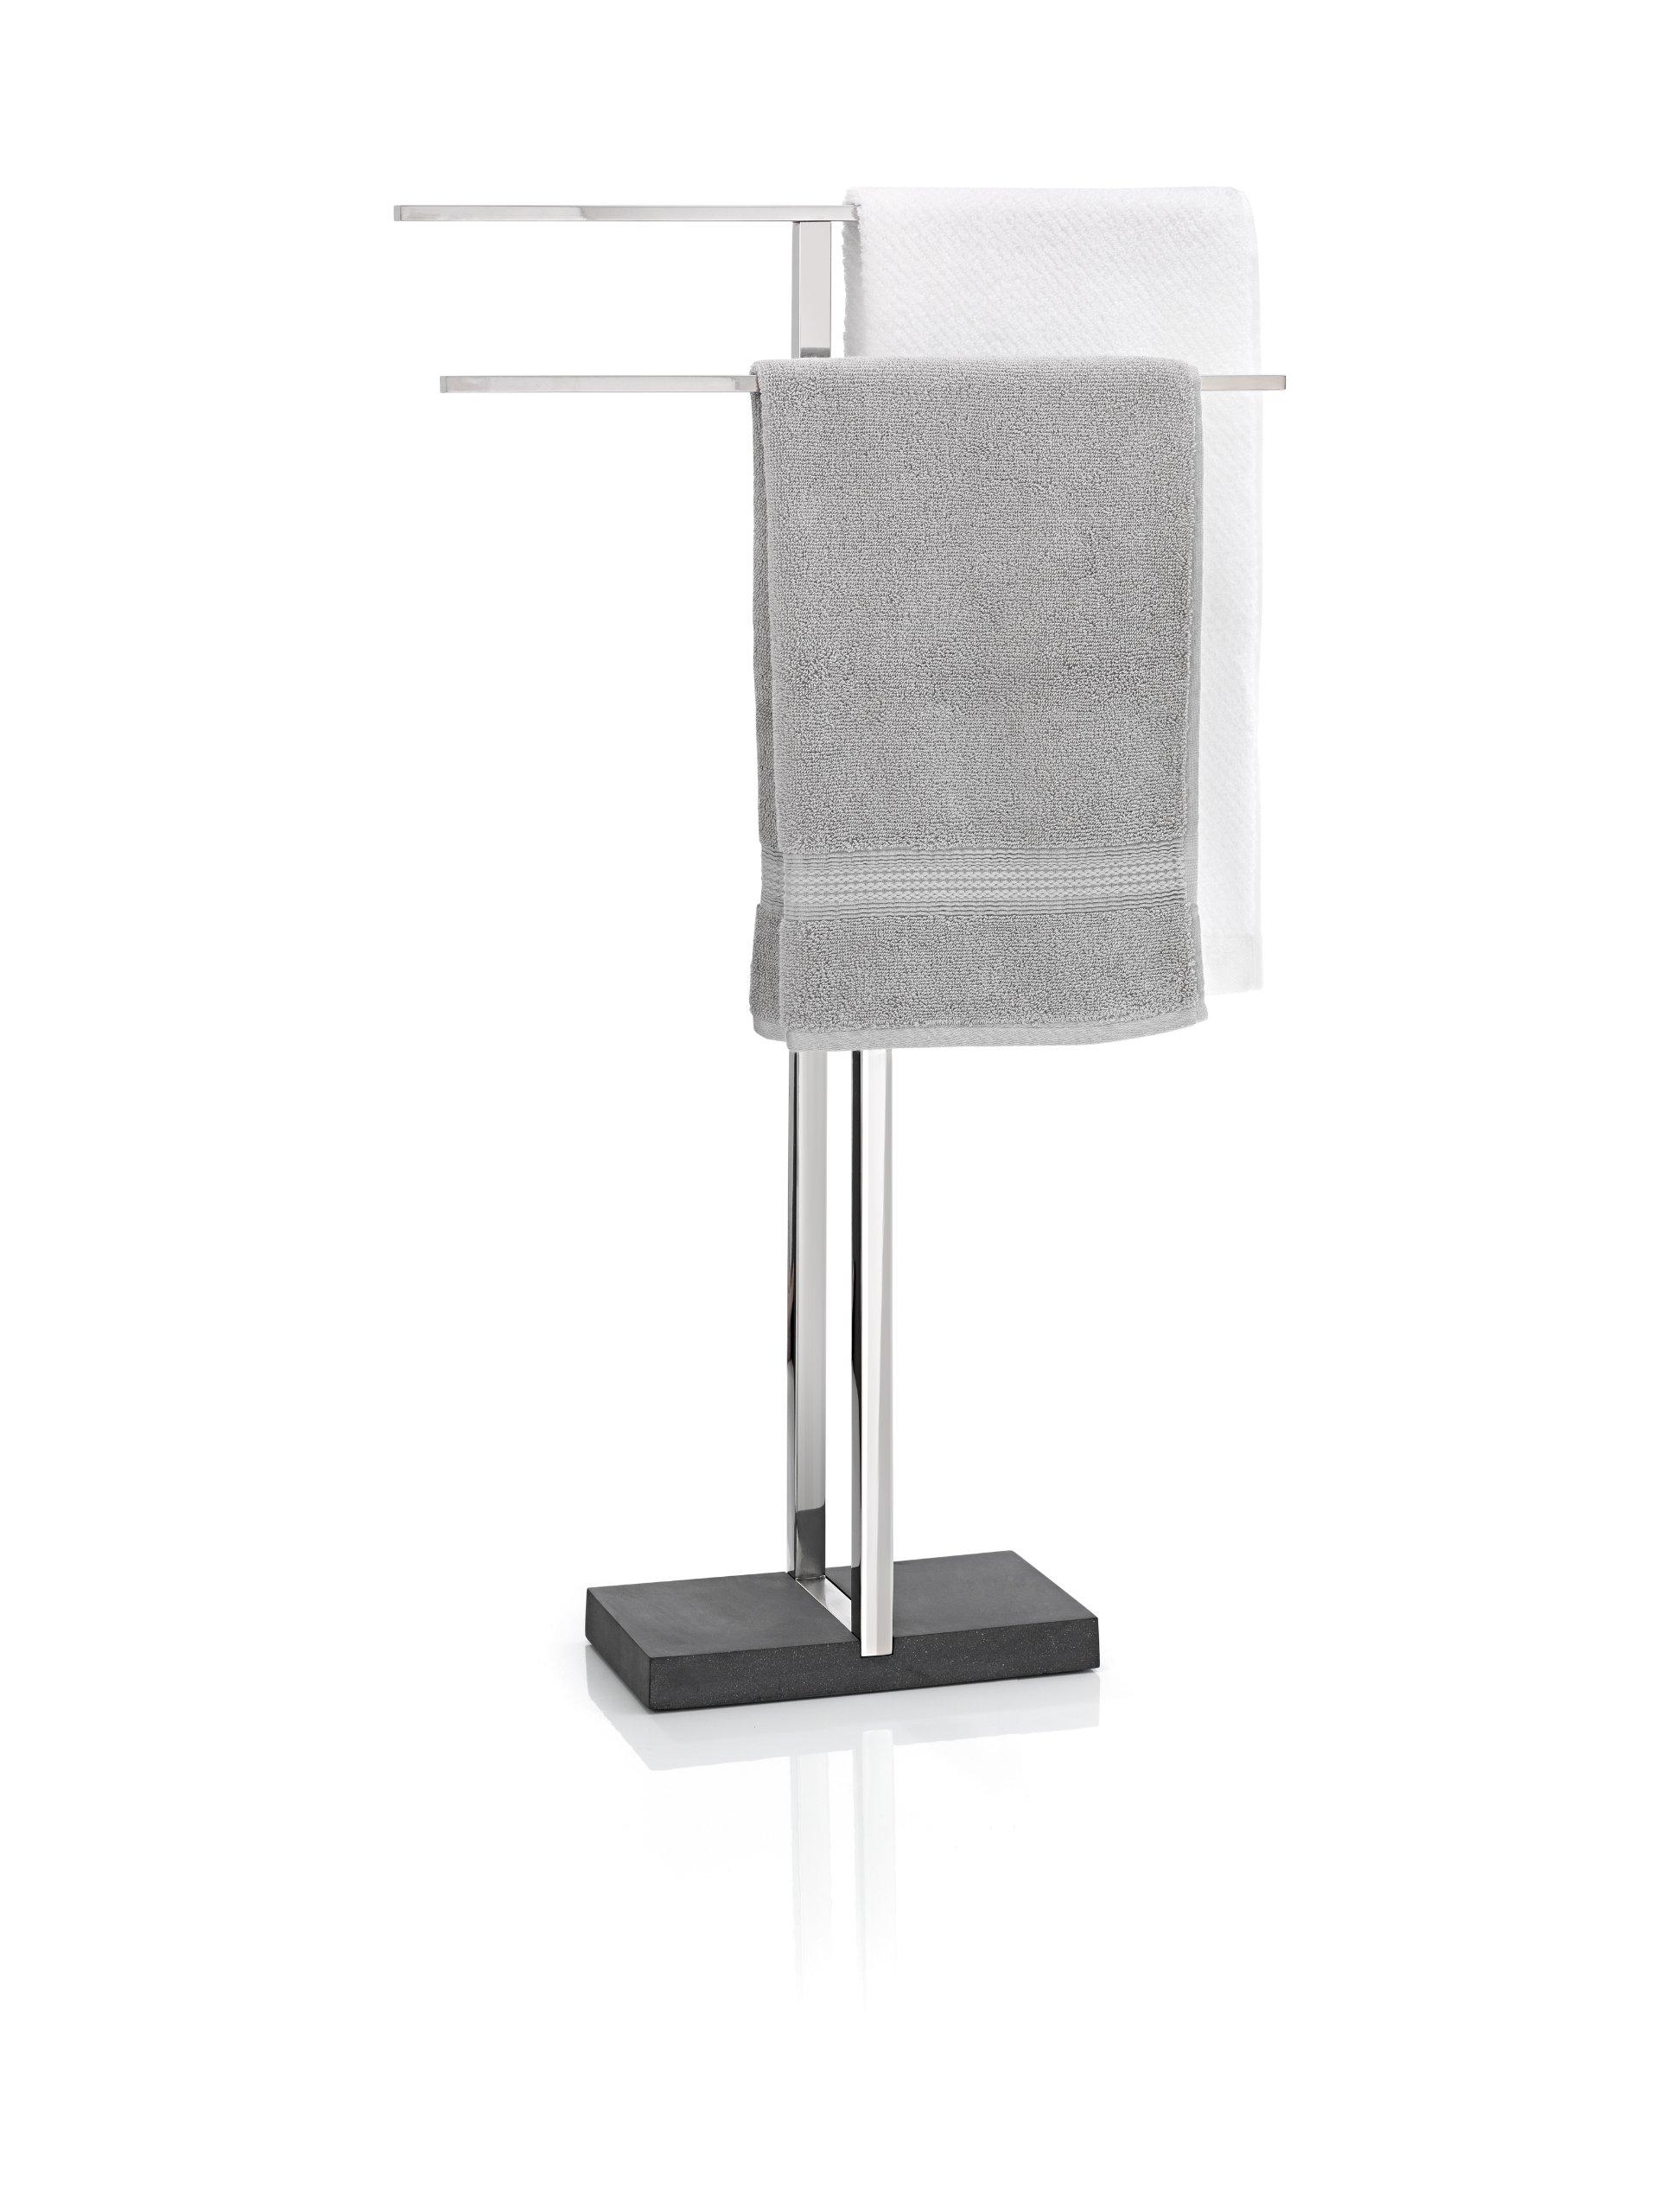 Blomus Floor Standing Towel Rack Stand, Polished Stainless Steel